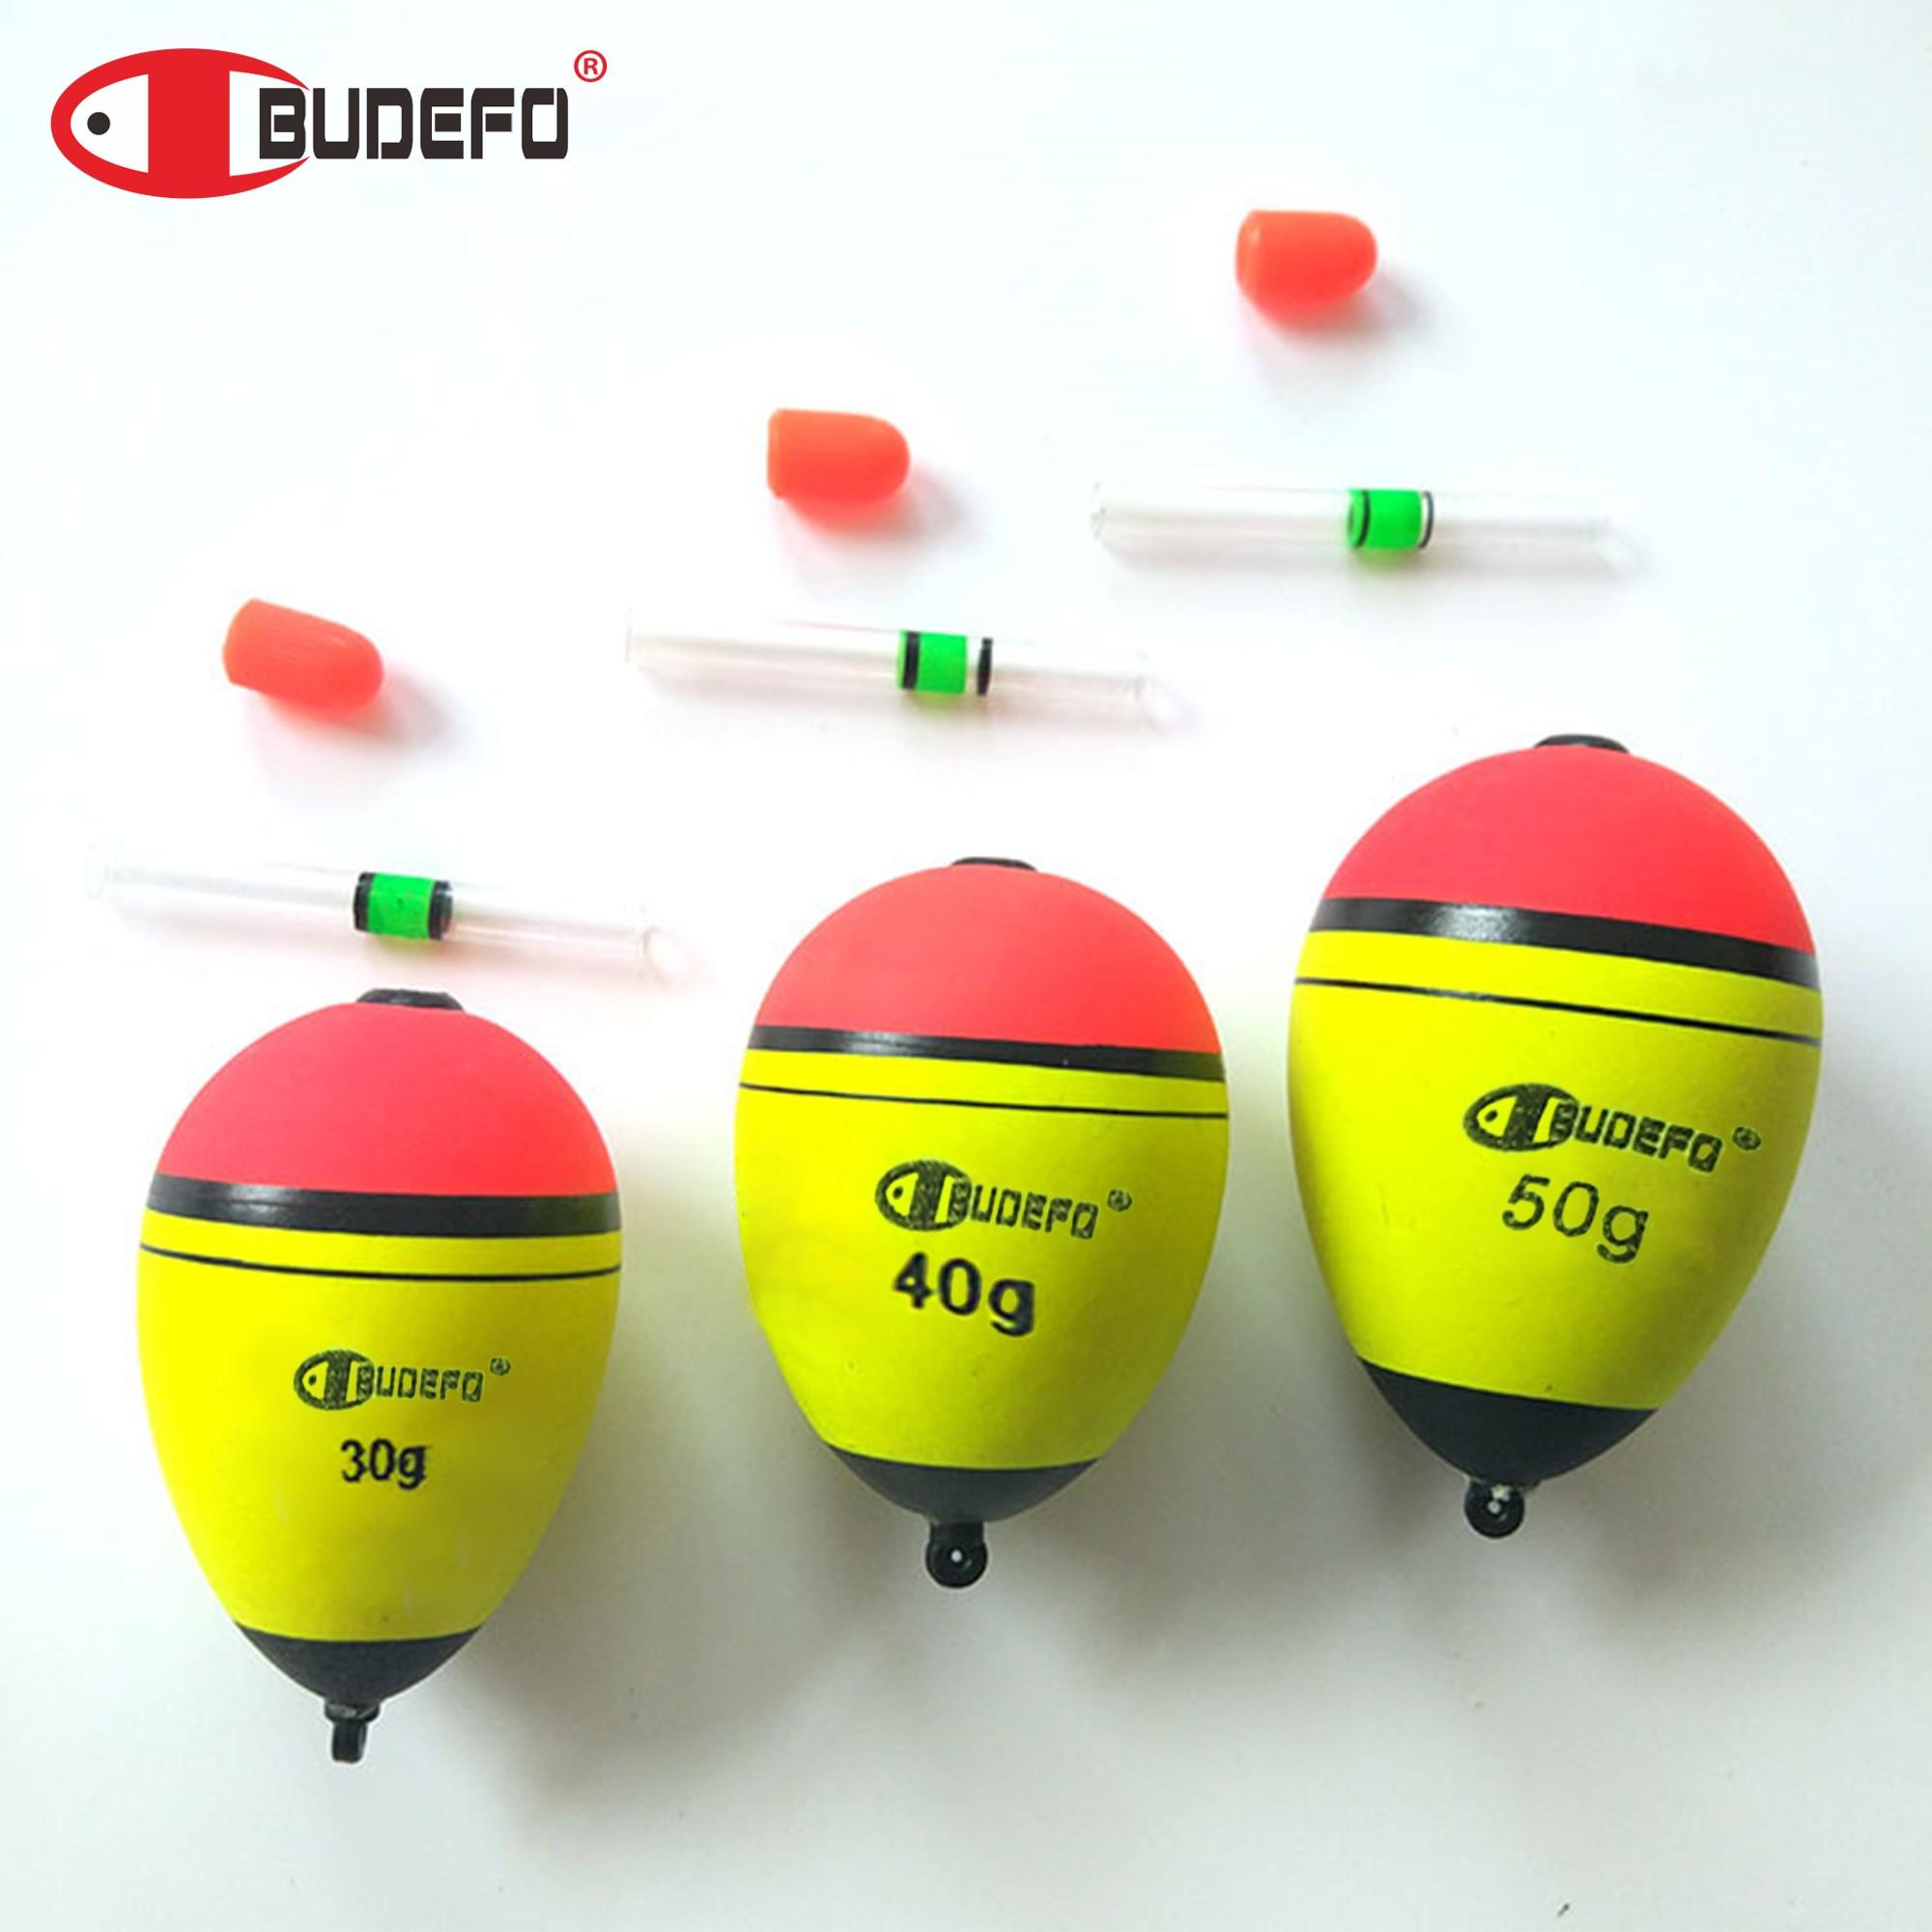 BUDEFO5Pcs de calidad superior boya para pescar 5-80g EVA boya mar cebo de pesca accesorios de equipo de pesca de carpa pesca float boya